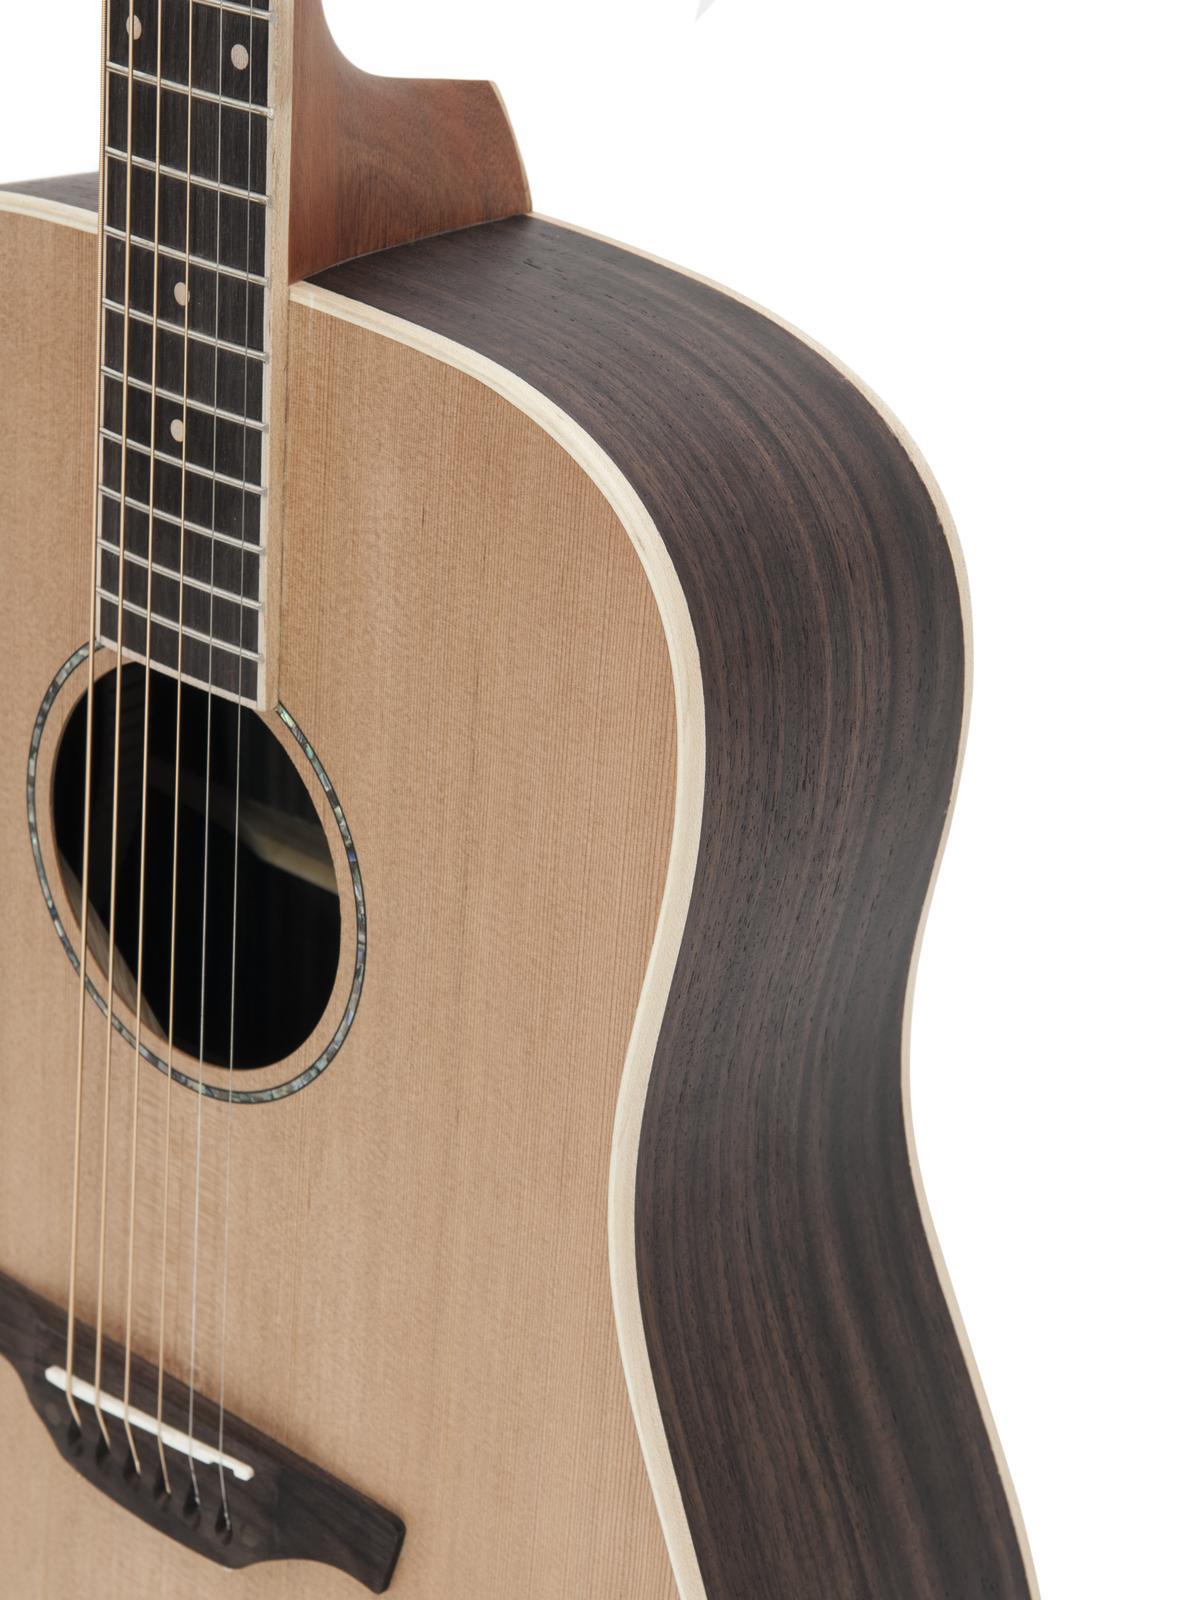 Chitarra acustica, western, colore nature, abete solido, DIMAVERY PWS-41